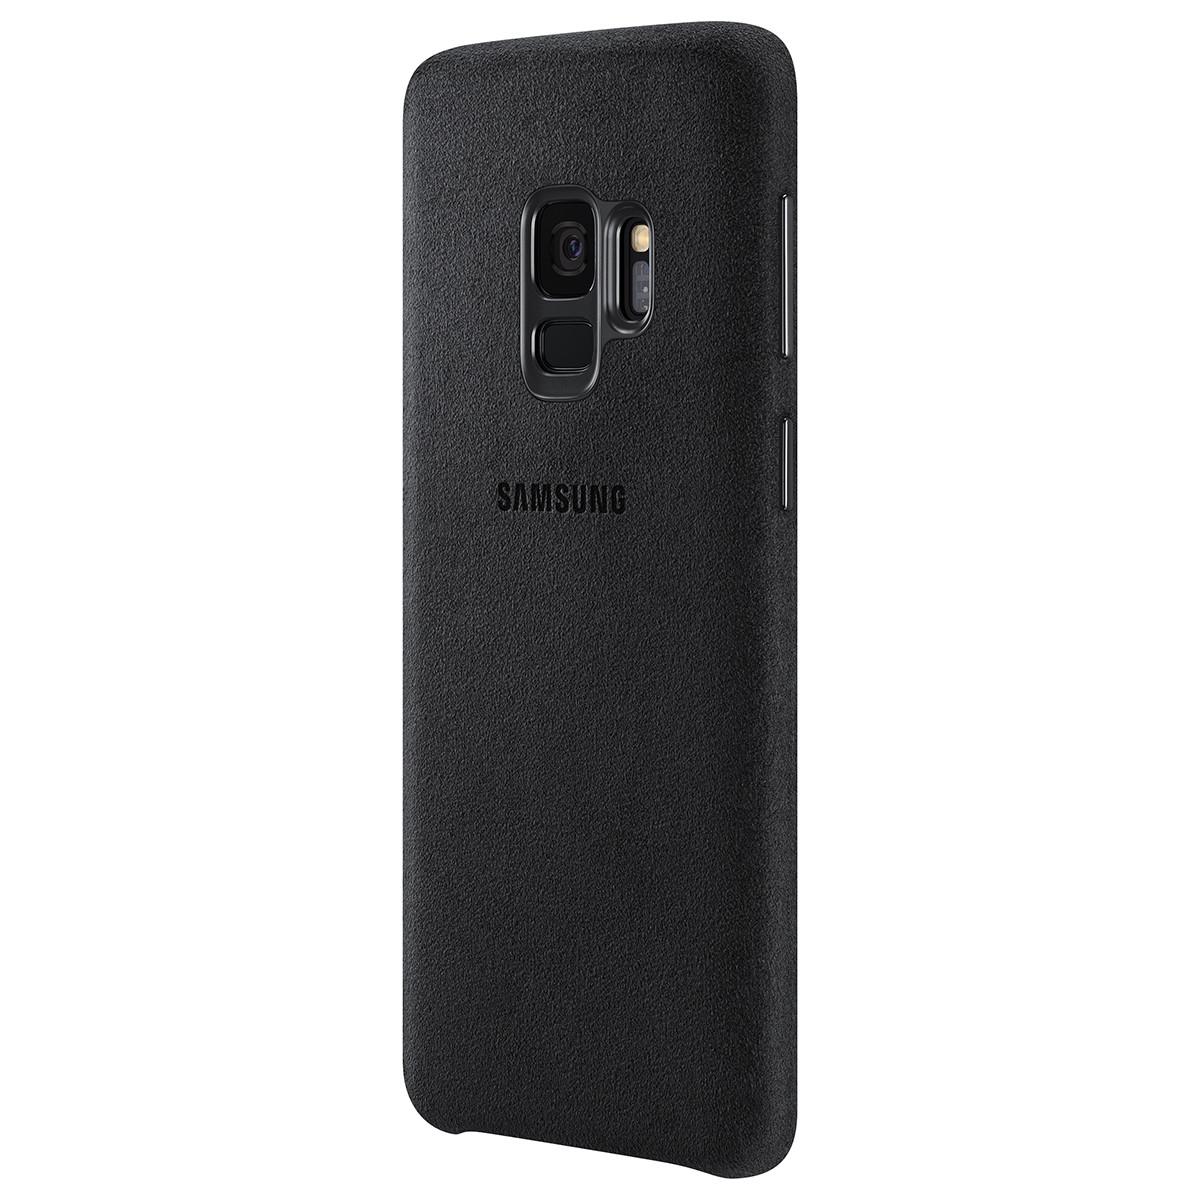 Чехол-накладка Alcantara Cover для Samsung Galaxy S9 SM-G960 Black (EF-XG960ABEGRU)